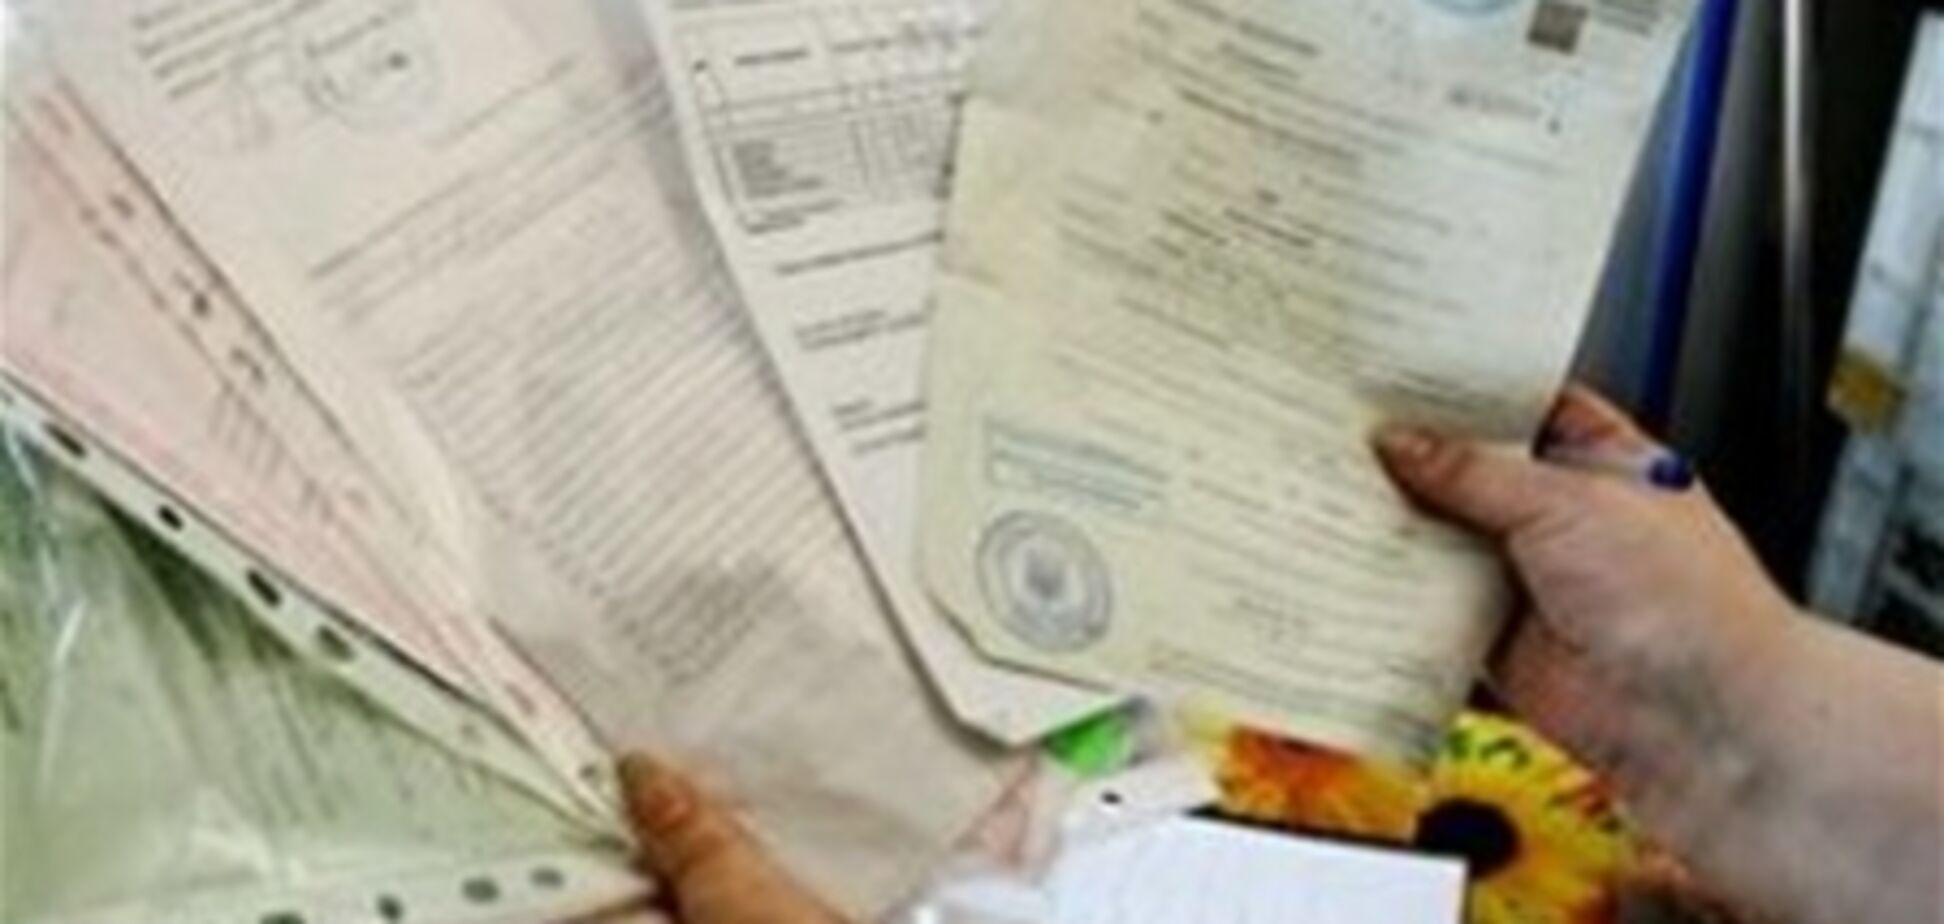 Нотариусам предоставили право регистрации прав на недвижимость